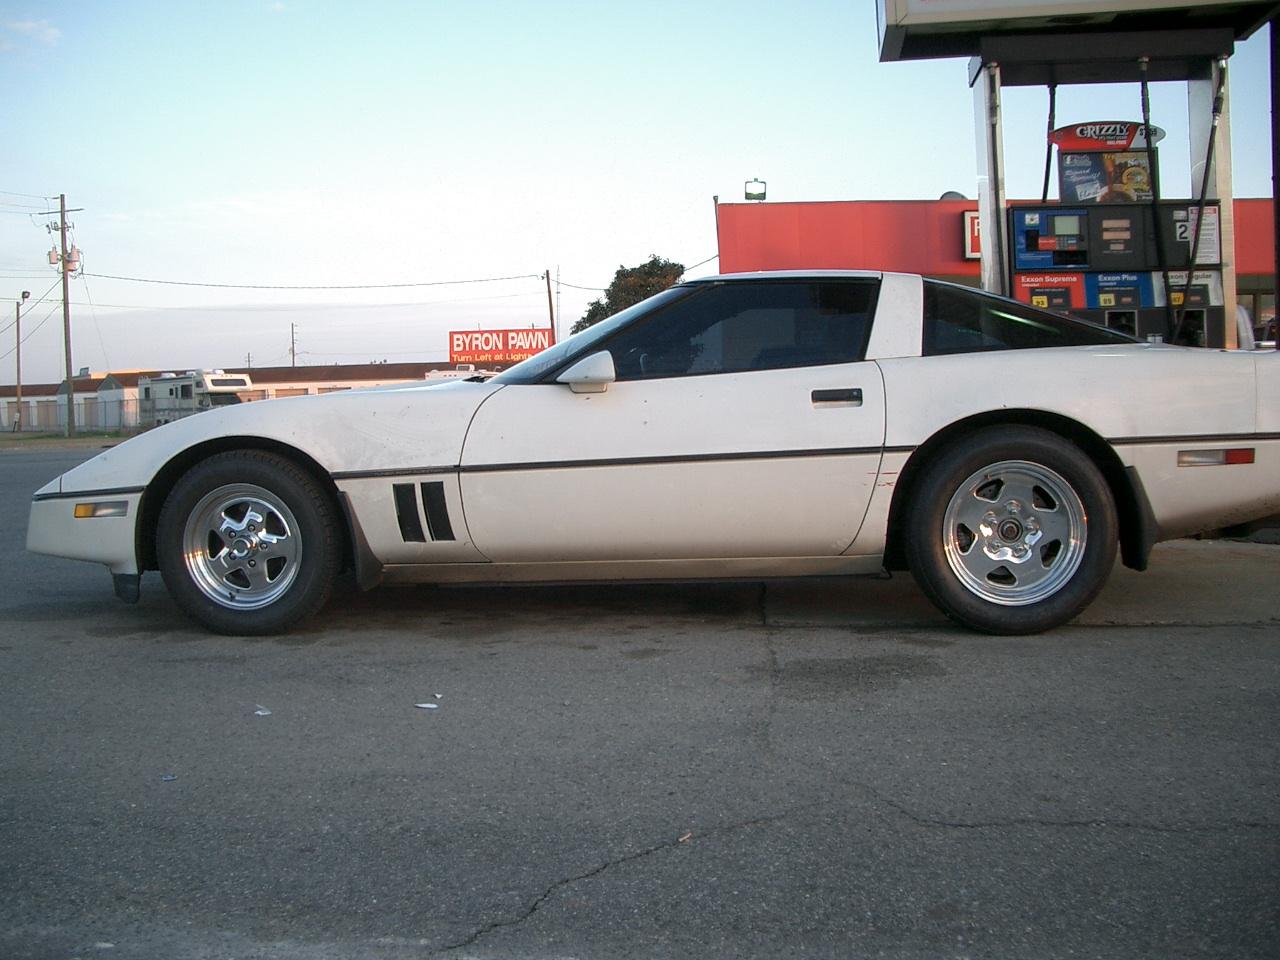 1985 Chevrolet Corvette L98 1/4 mile Drag Racing timeslip